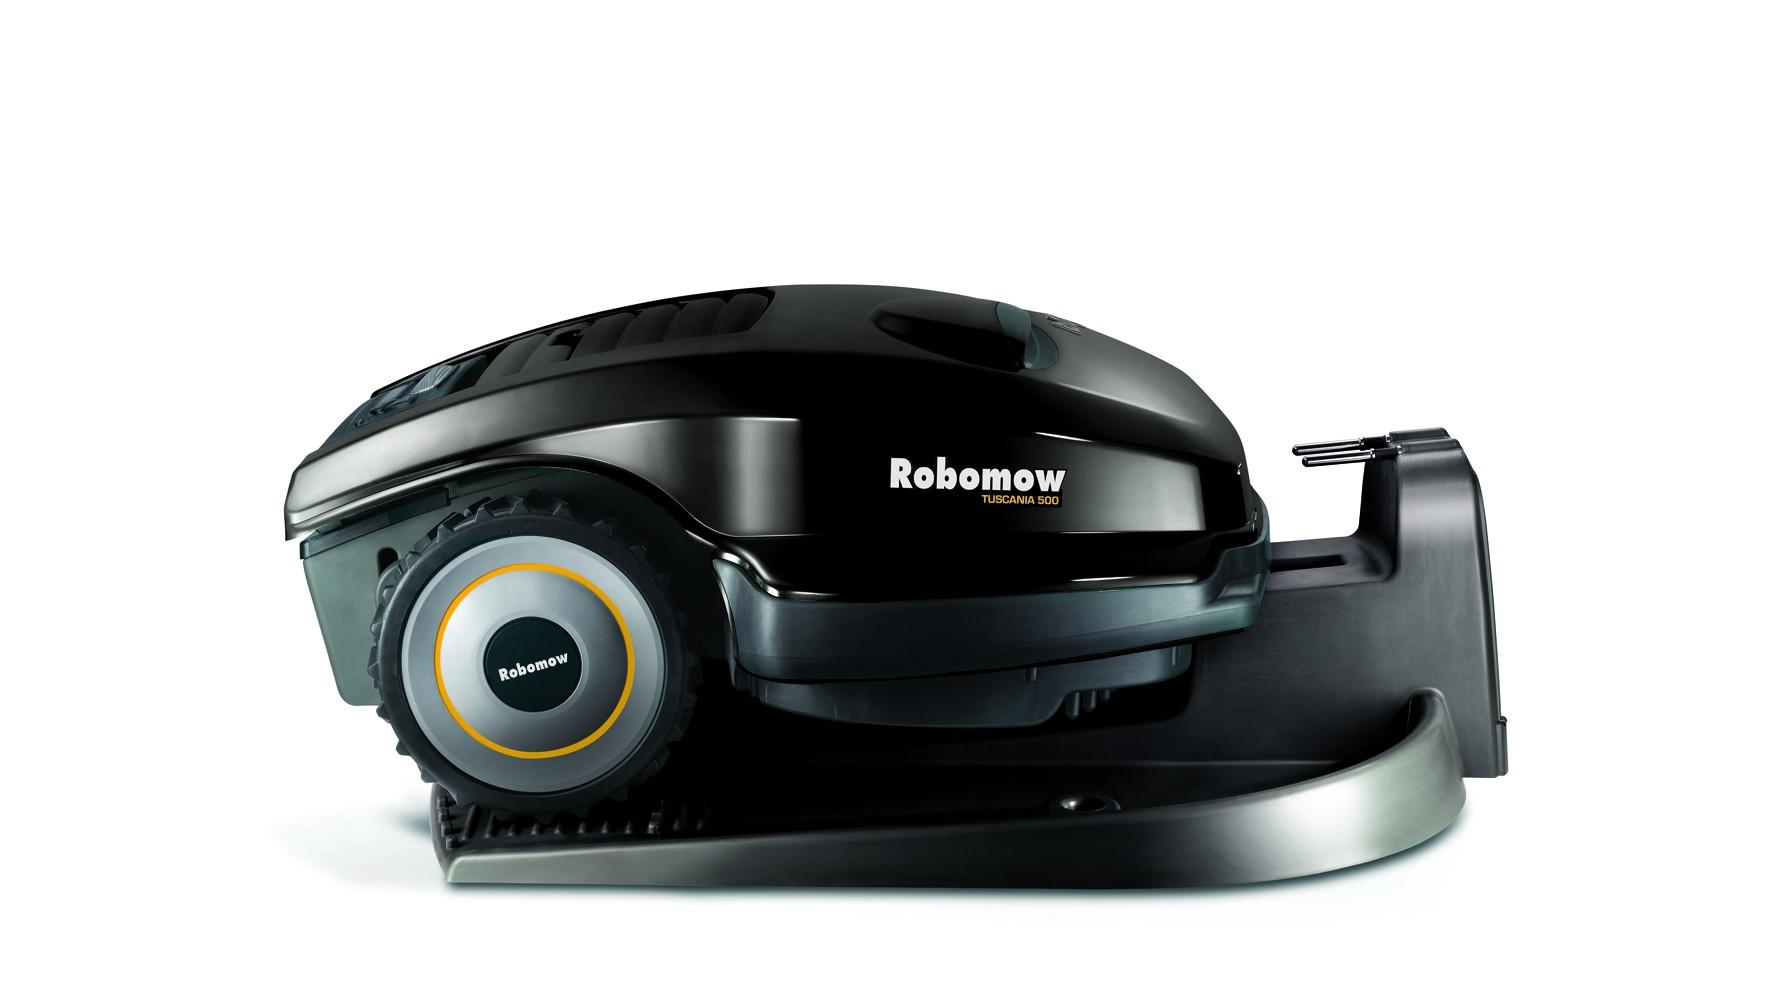 test et avis du robot tondeuse robomow tuscania 500. Black Bedroom Furniture Sets. Home Design Ideas